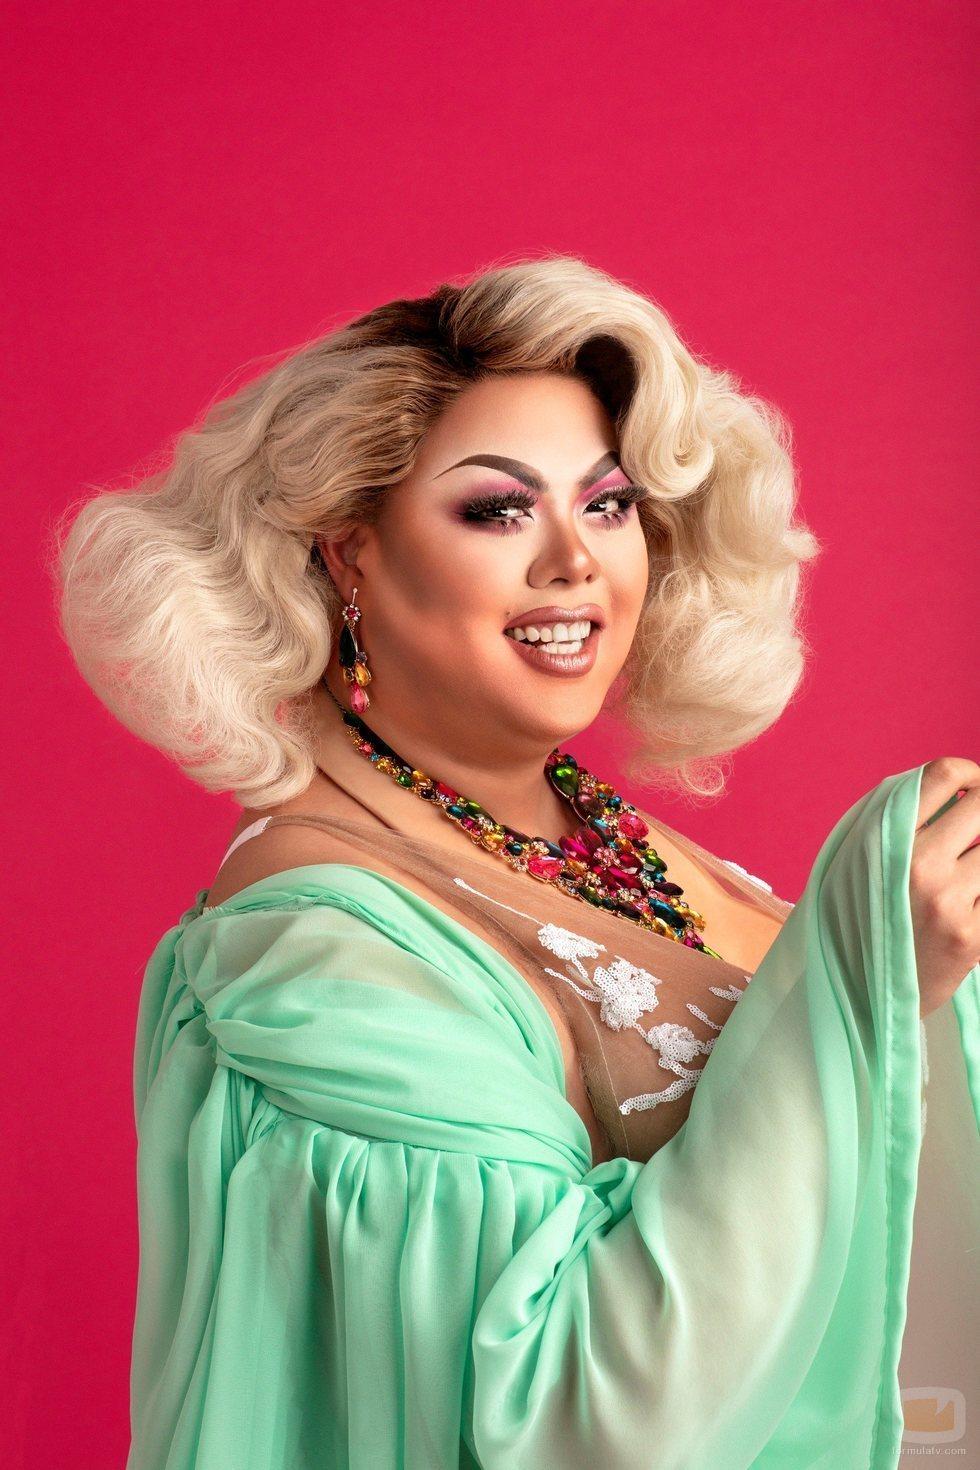 Sum Ting Wong, concursante de 'RuPaul's Drag Race UK'